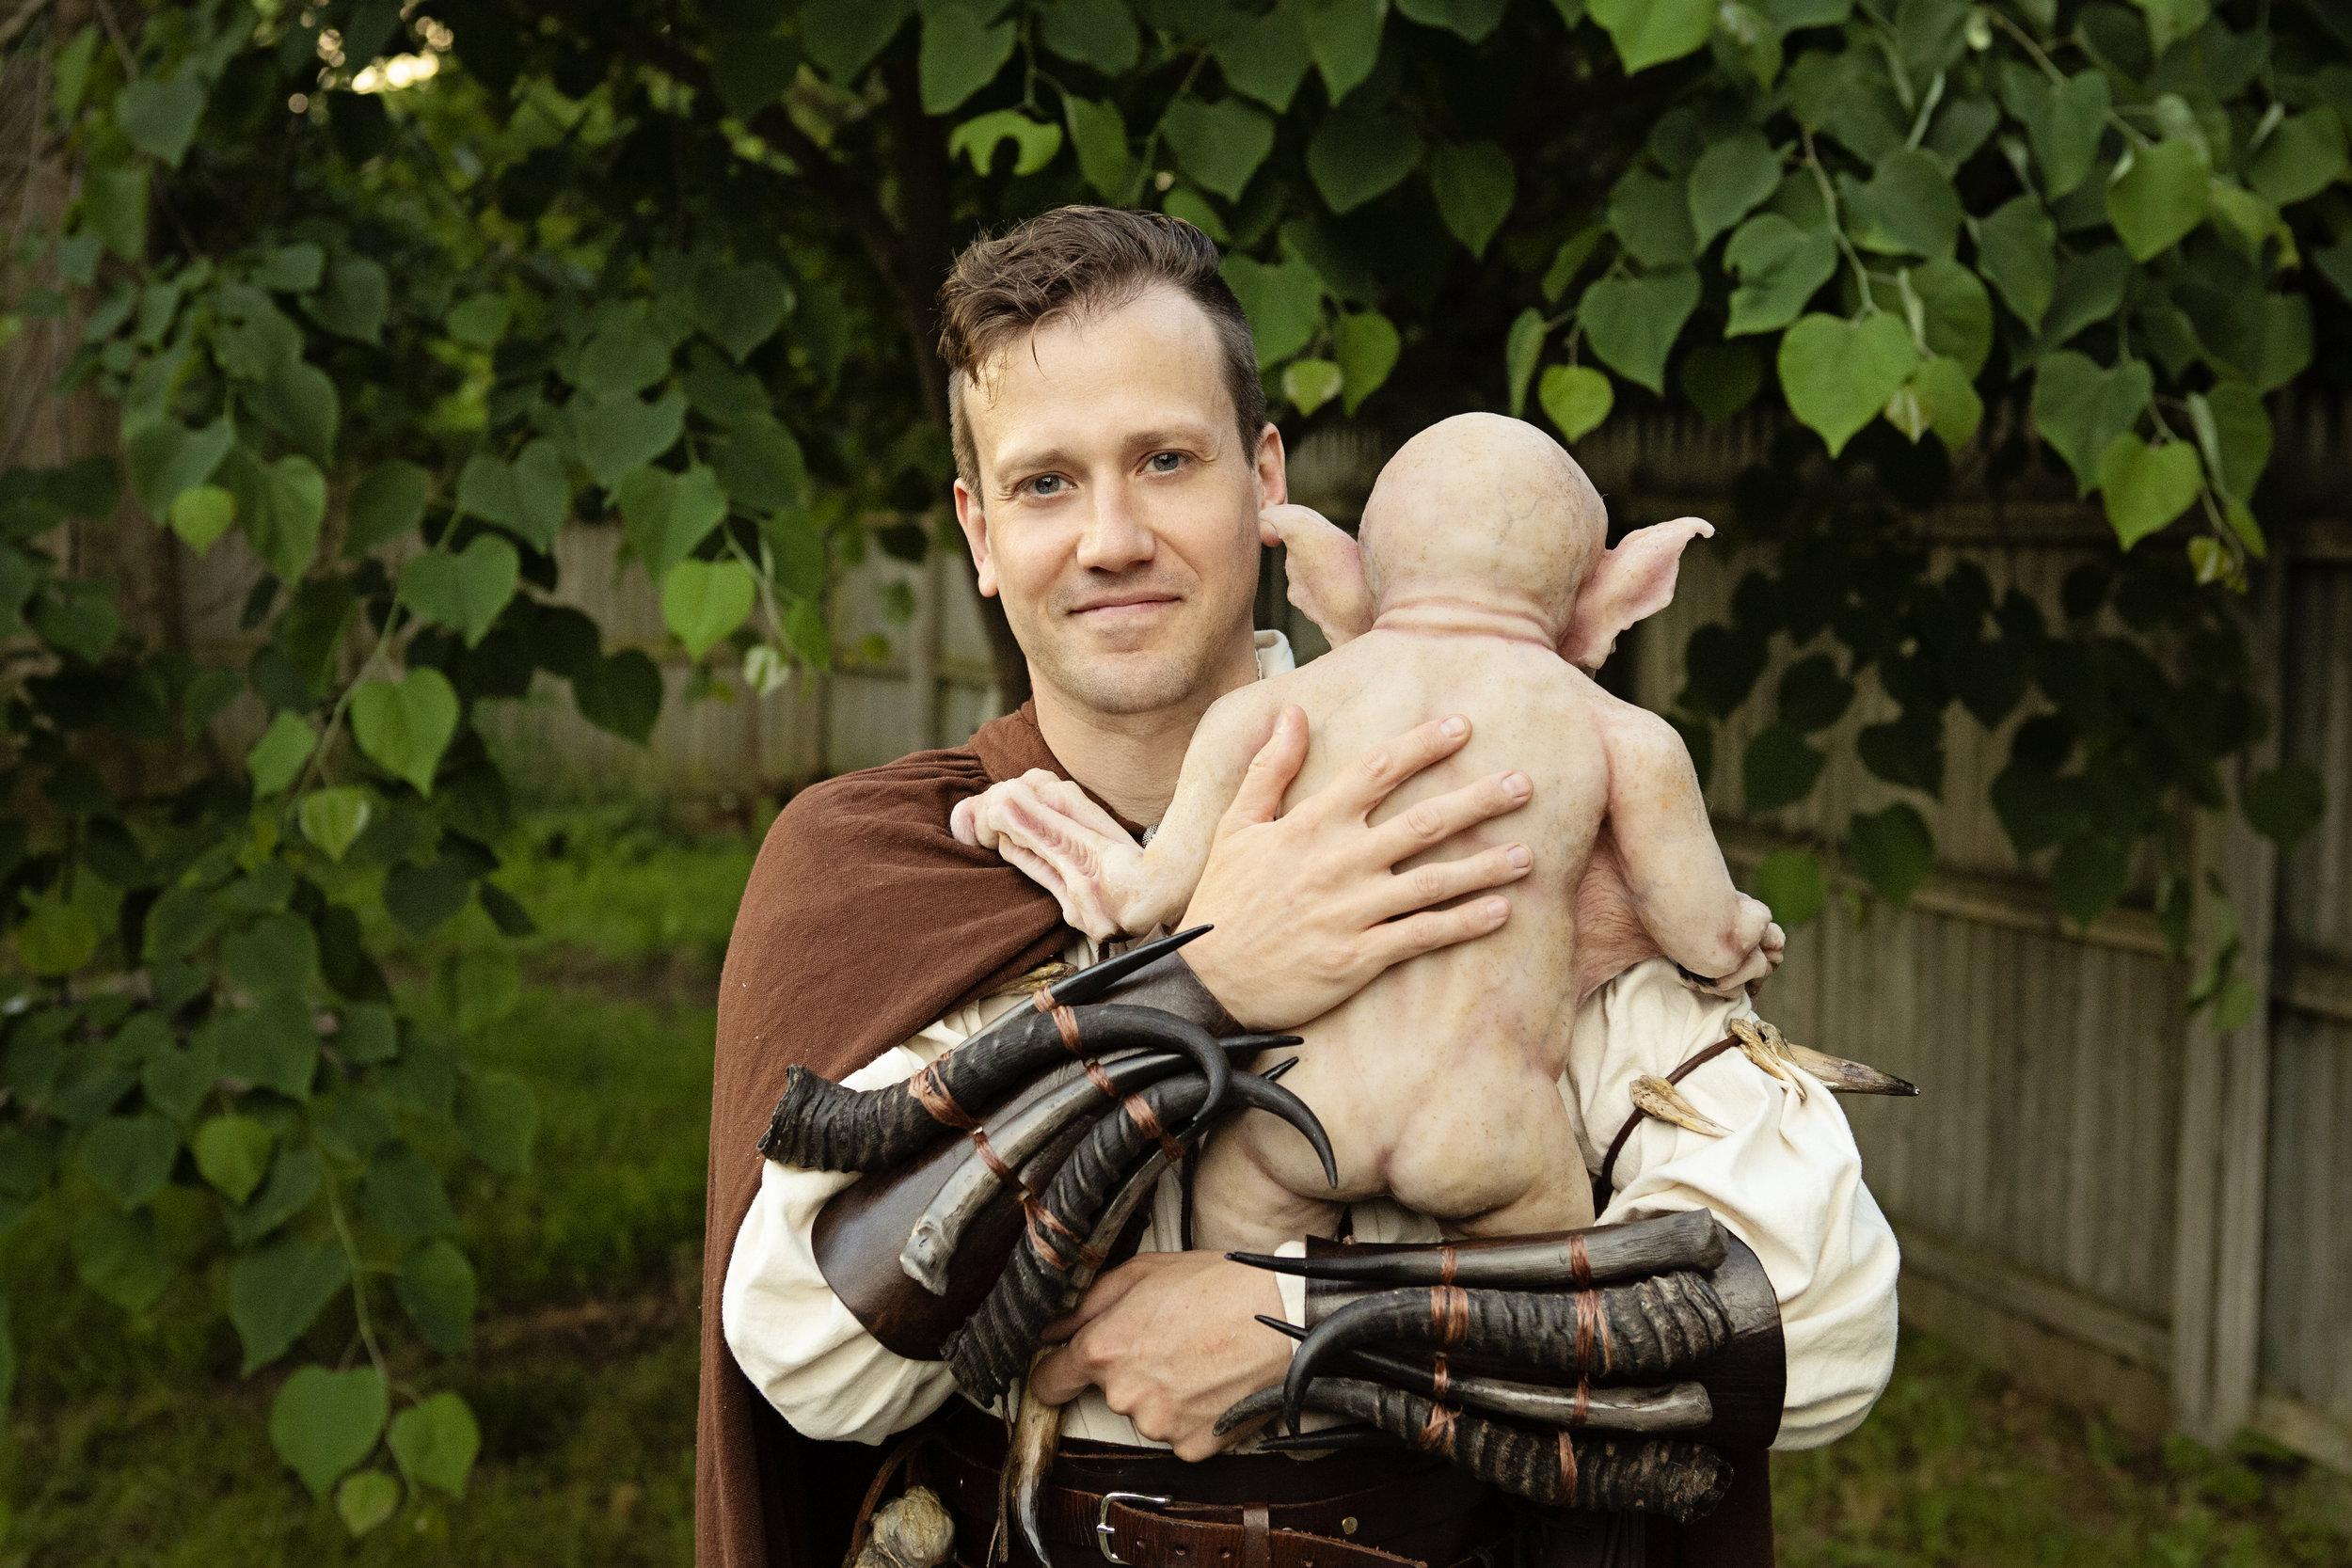 Lil Butt  | Newborn Vampire  | Newborn photoshoot | Ravendark Creations Vampire Baby | Newborn Photoshoots | Alyssia Booth's Candid & Studio | www.abcandidstudio.com